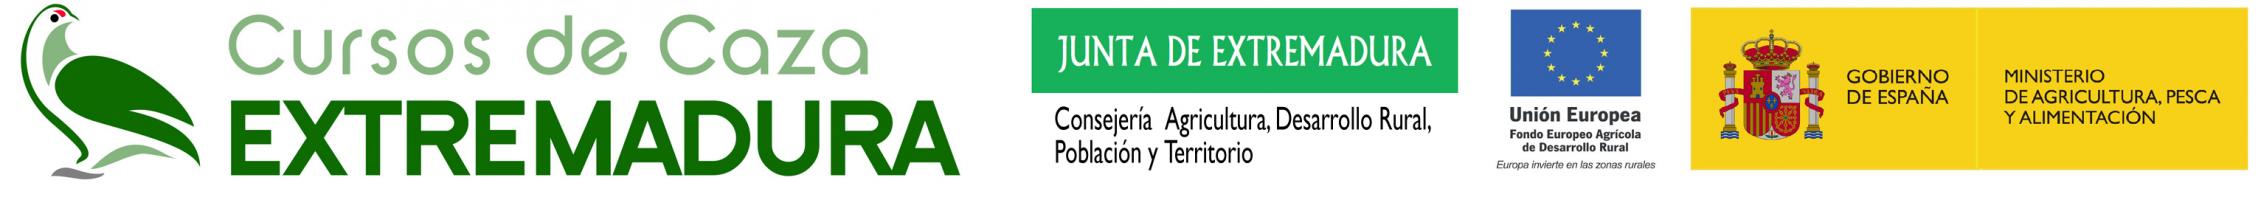 Cursos Caza Extremadura